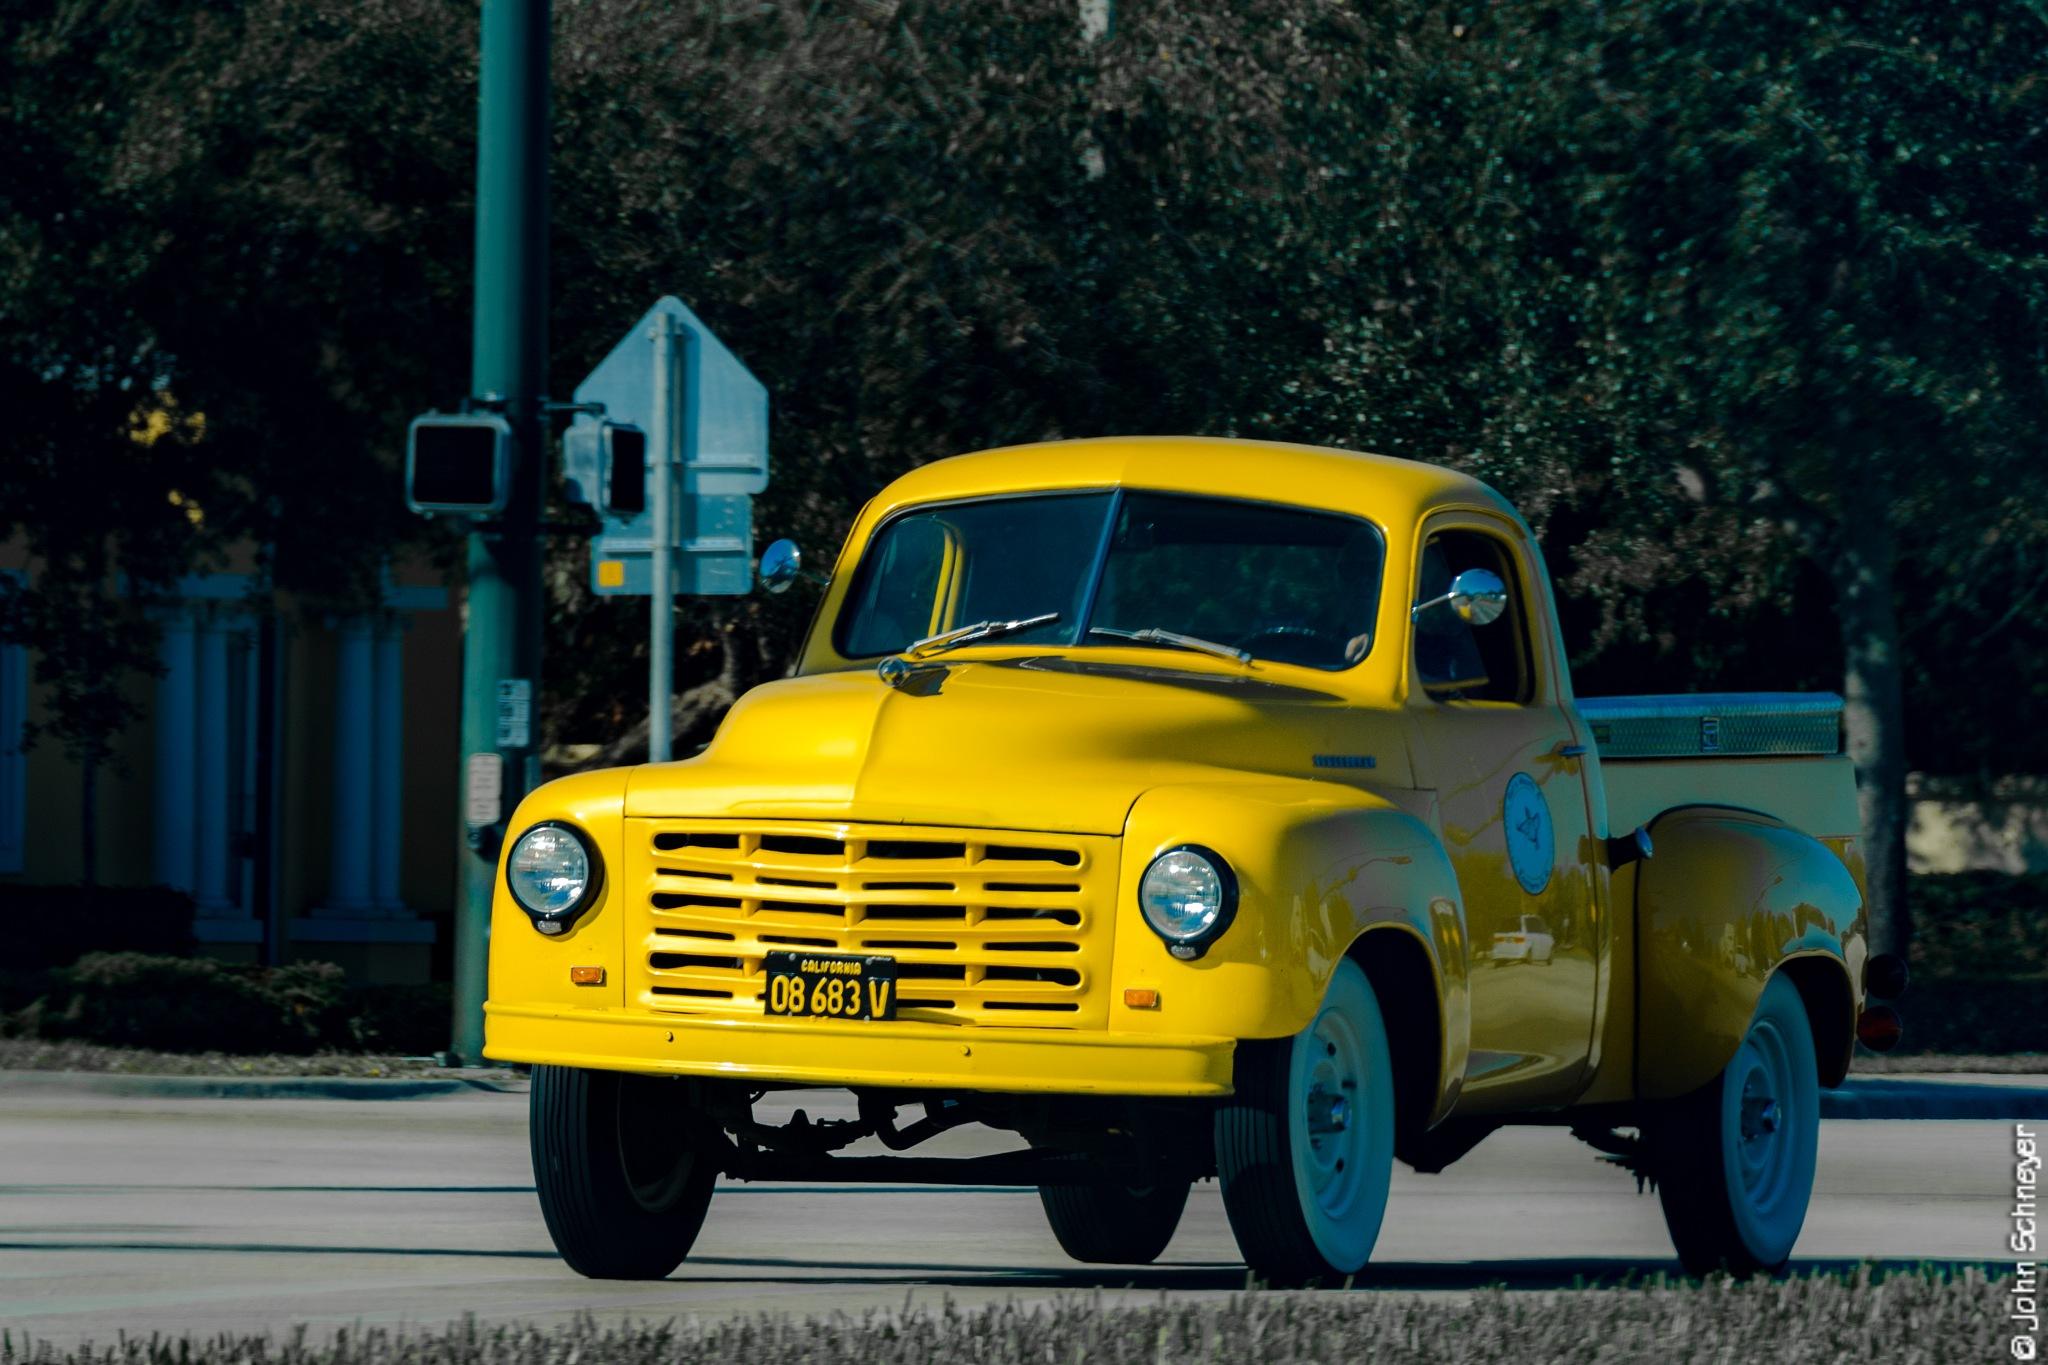 Yellow Truck by John Schneyer